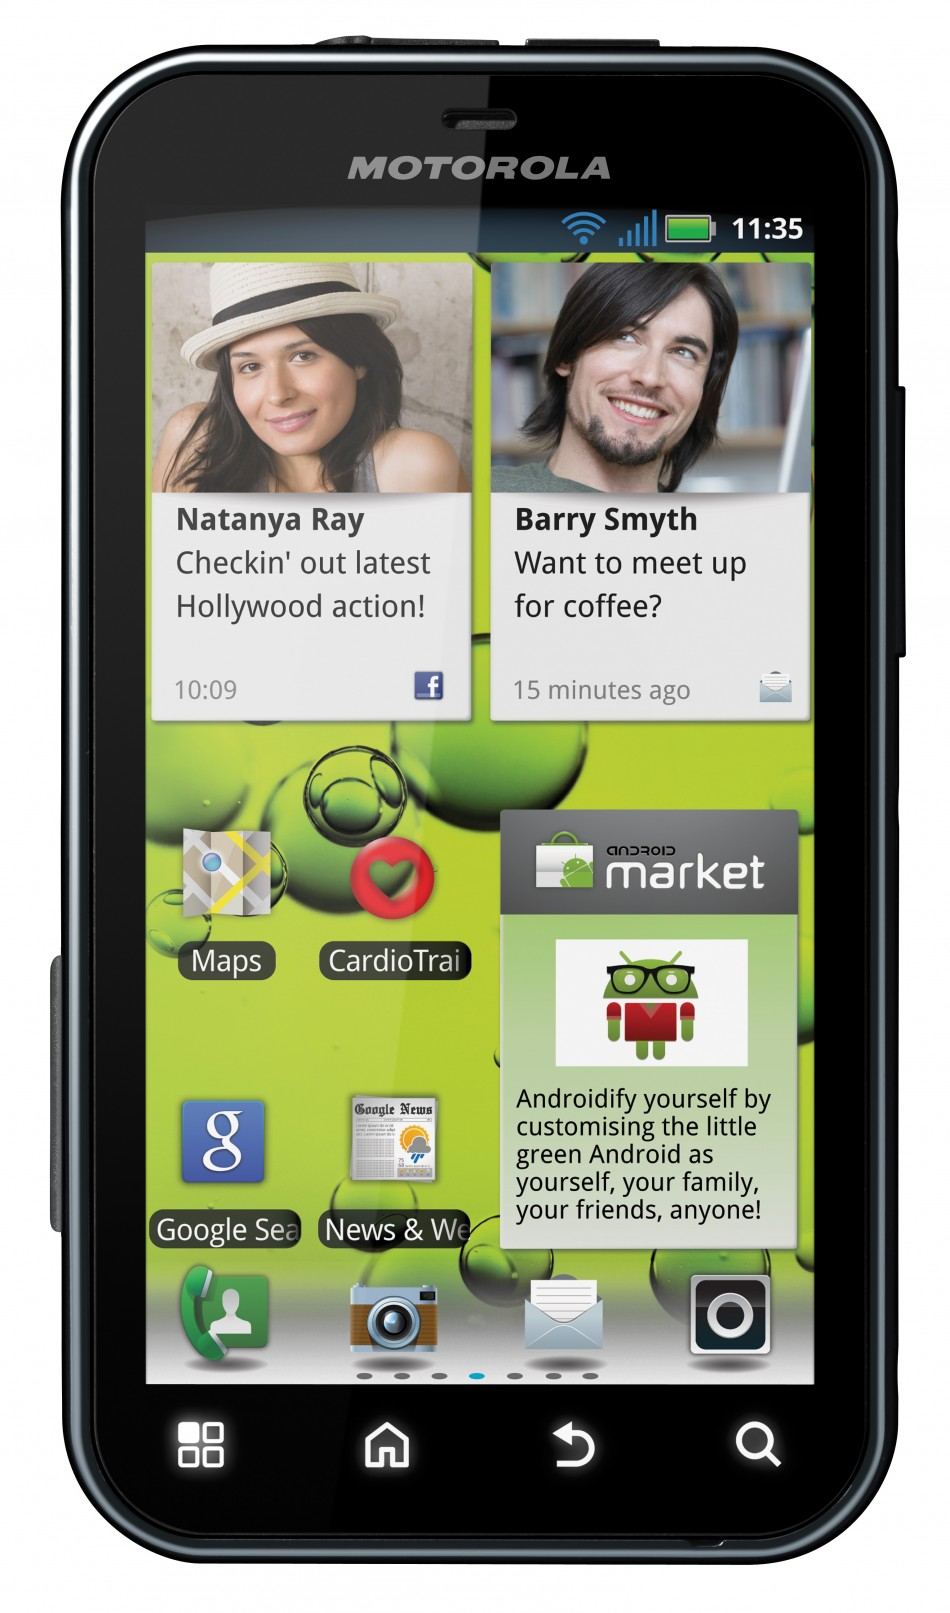 Motorola DEFY+ Unveiled Following Google Purchase